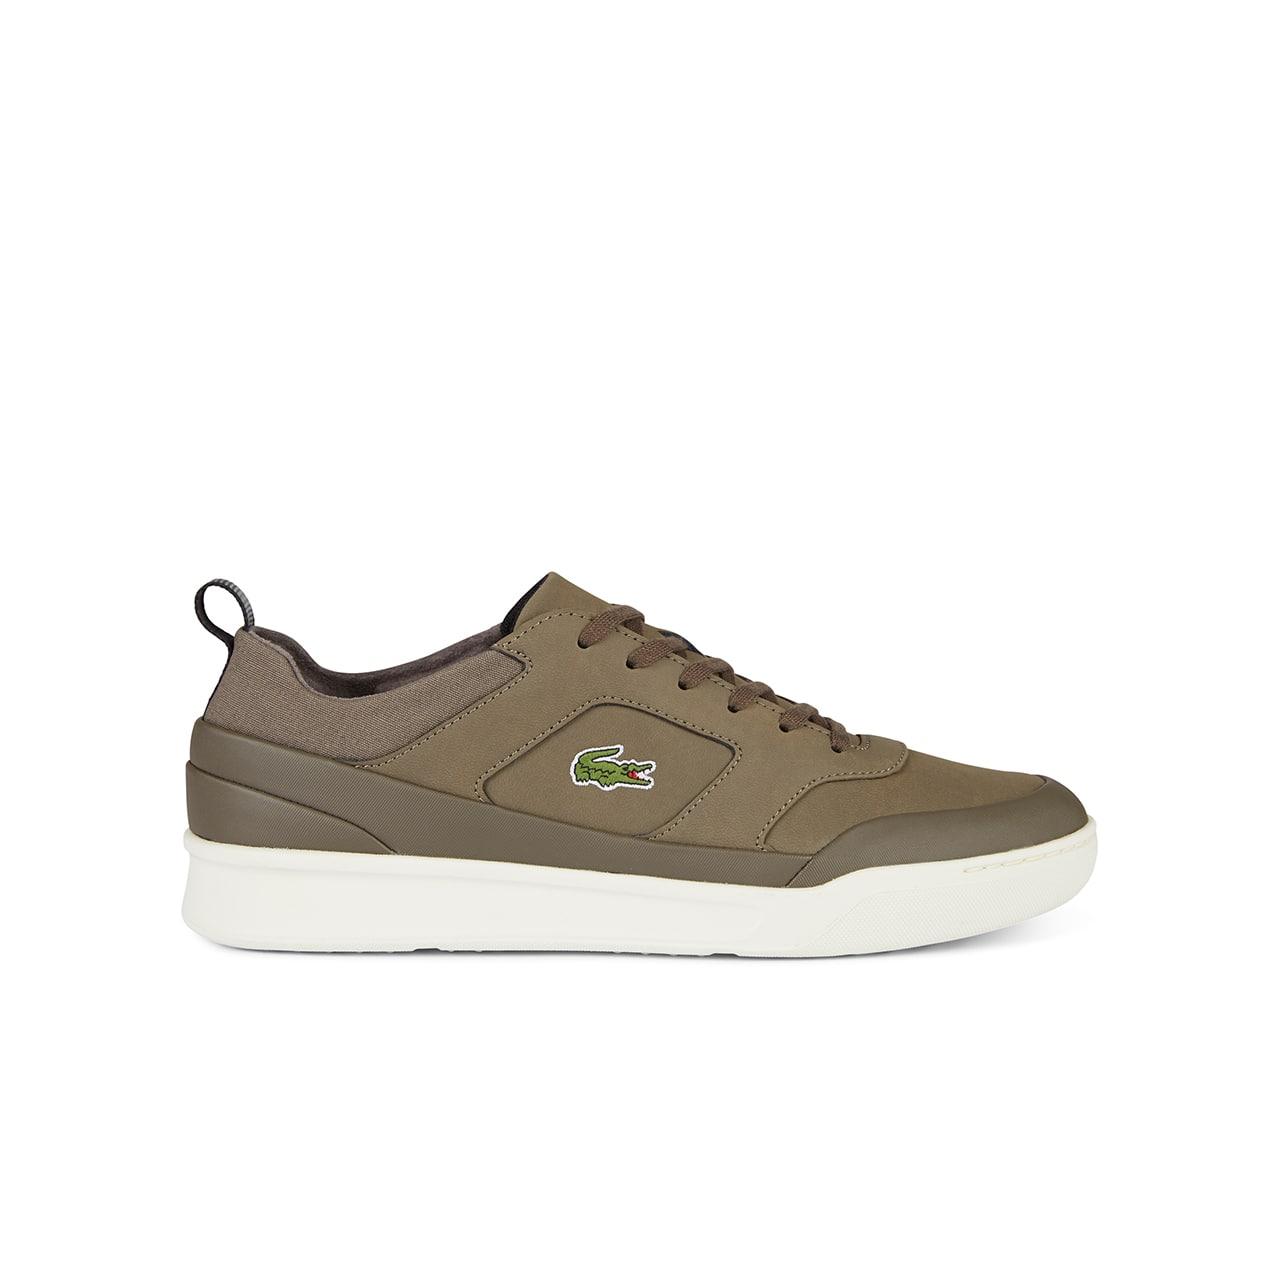 Lacoste Men's Sneakers Sport Explorateur Leather gII6xw